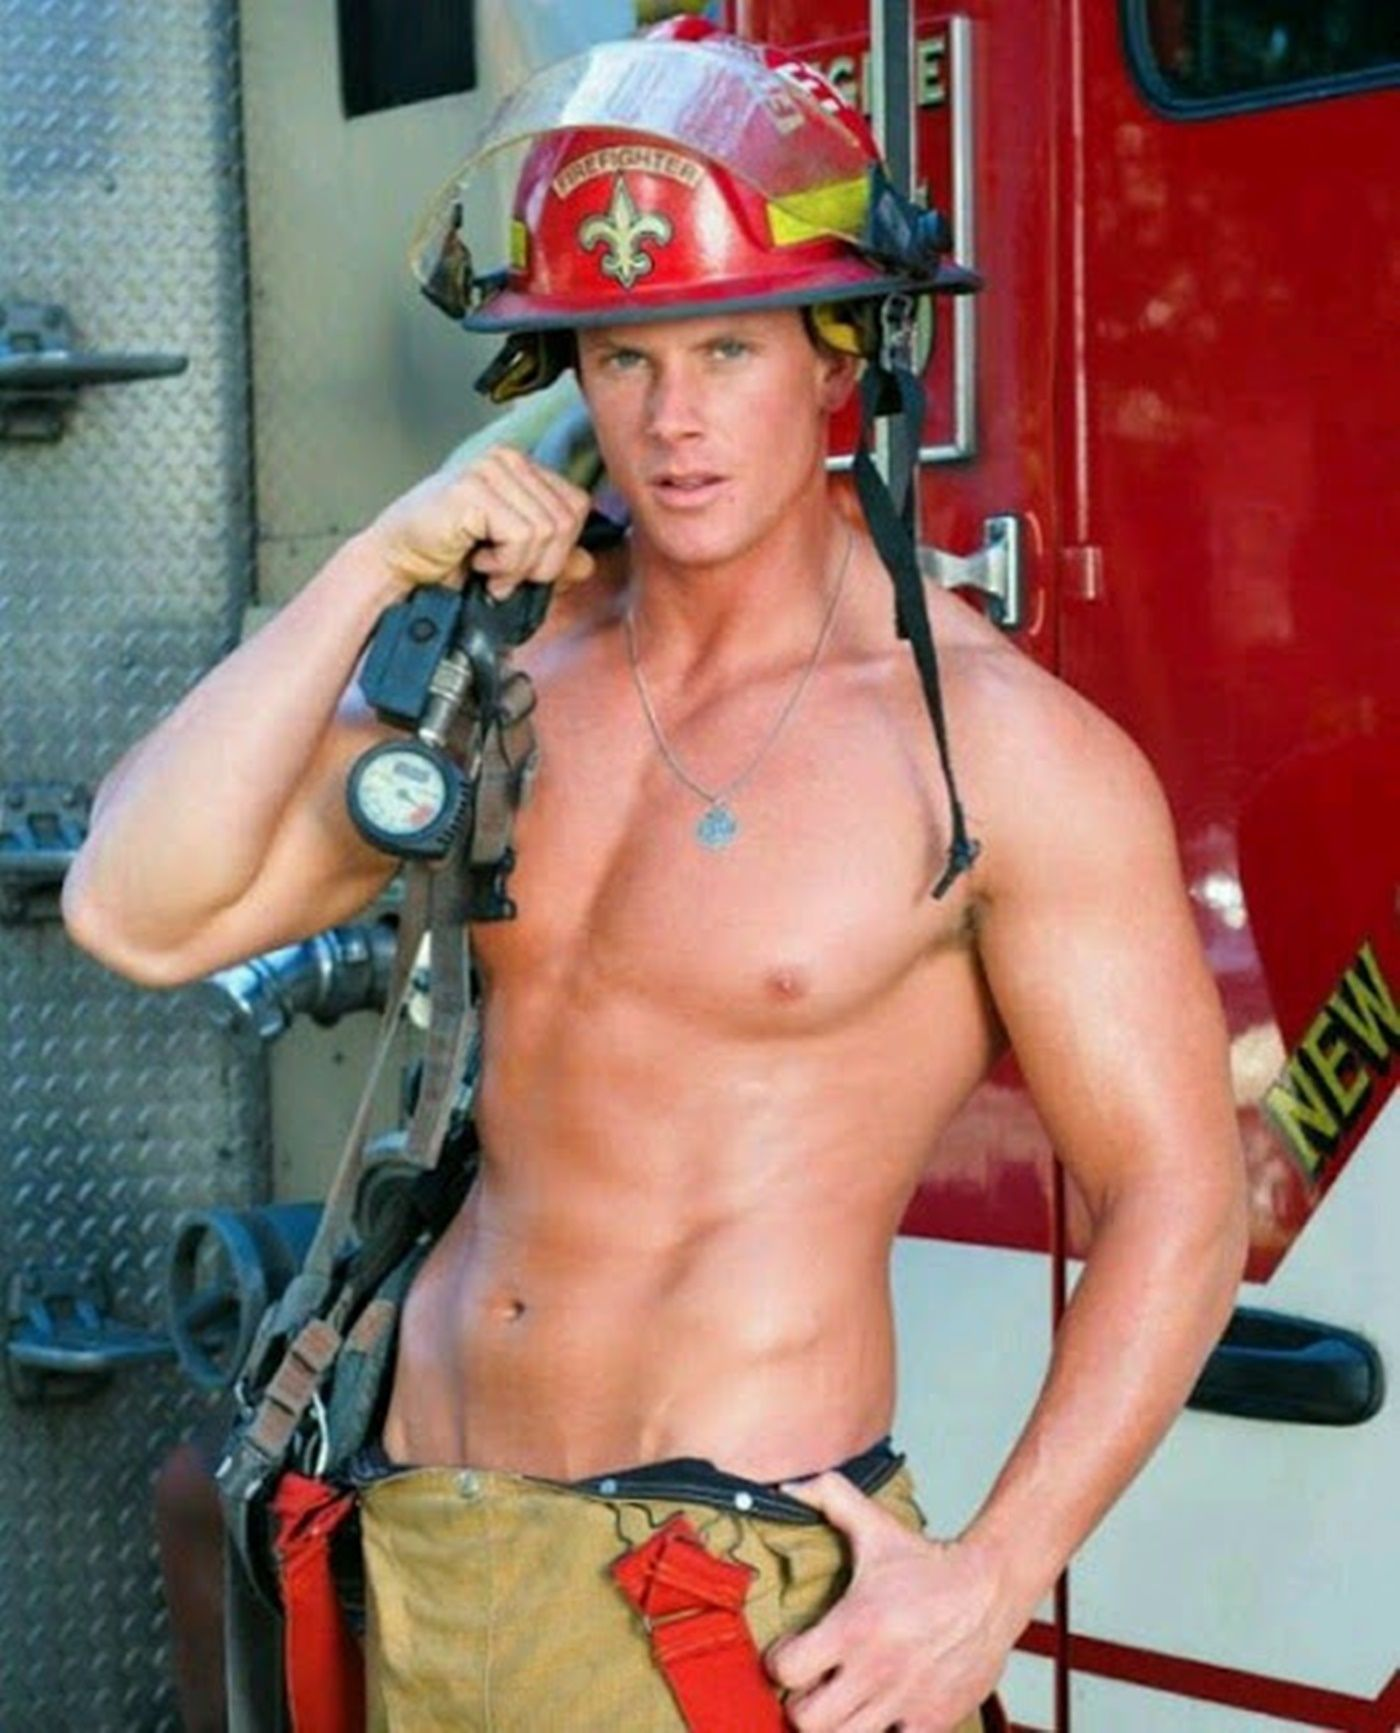 Fat naked fireman, school porn pics in hd bigger size